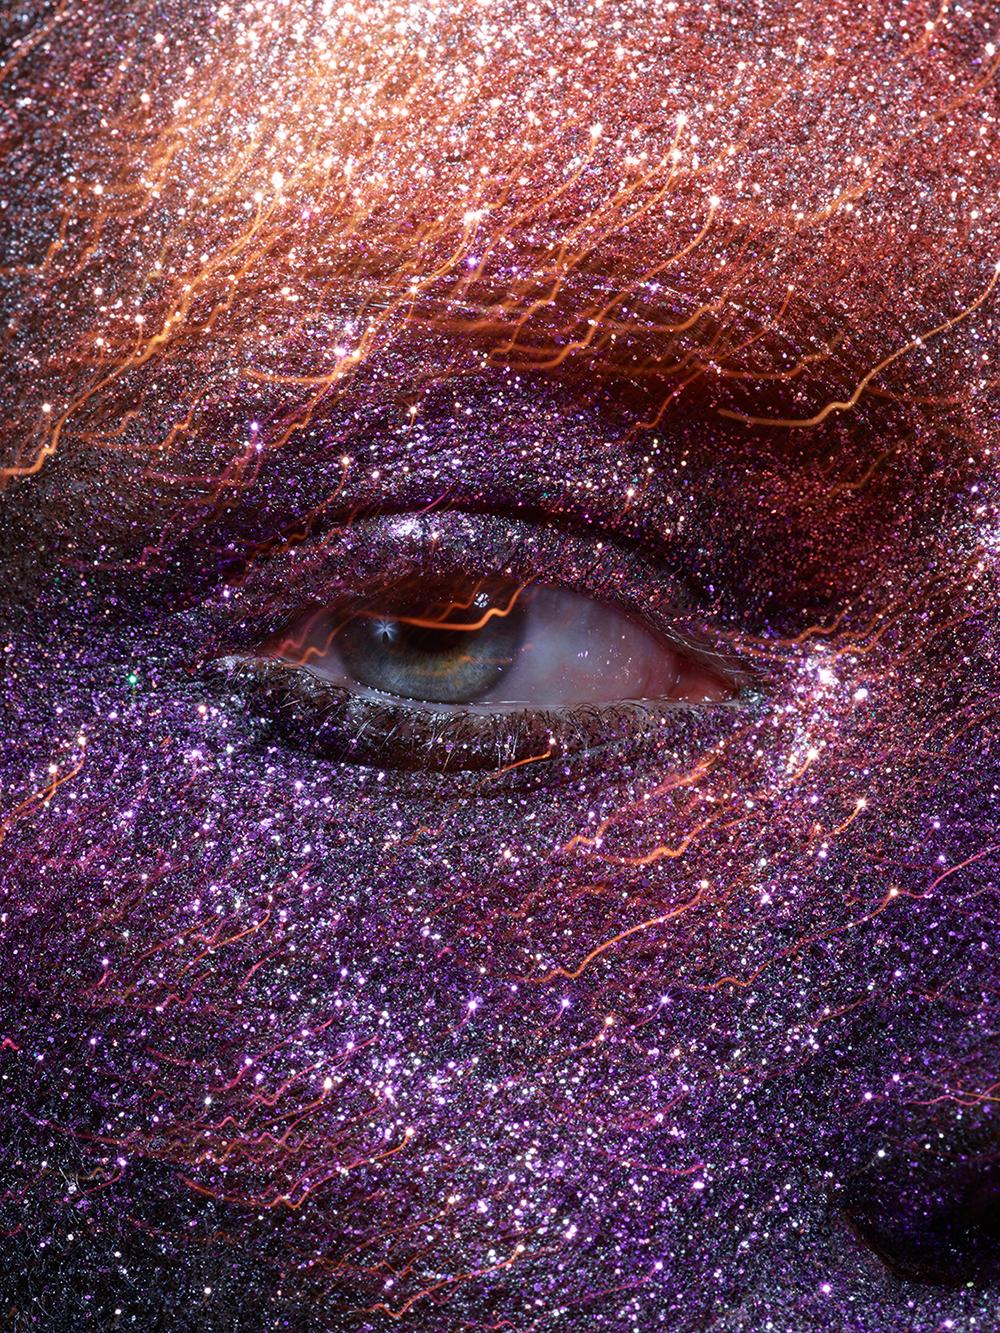 Glitter Phase One16983 as Smart Object-1.jpg